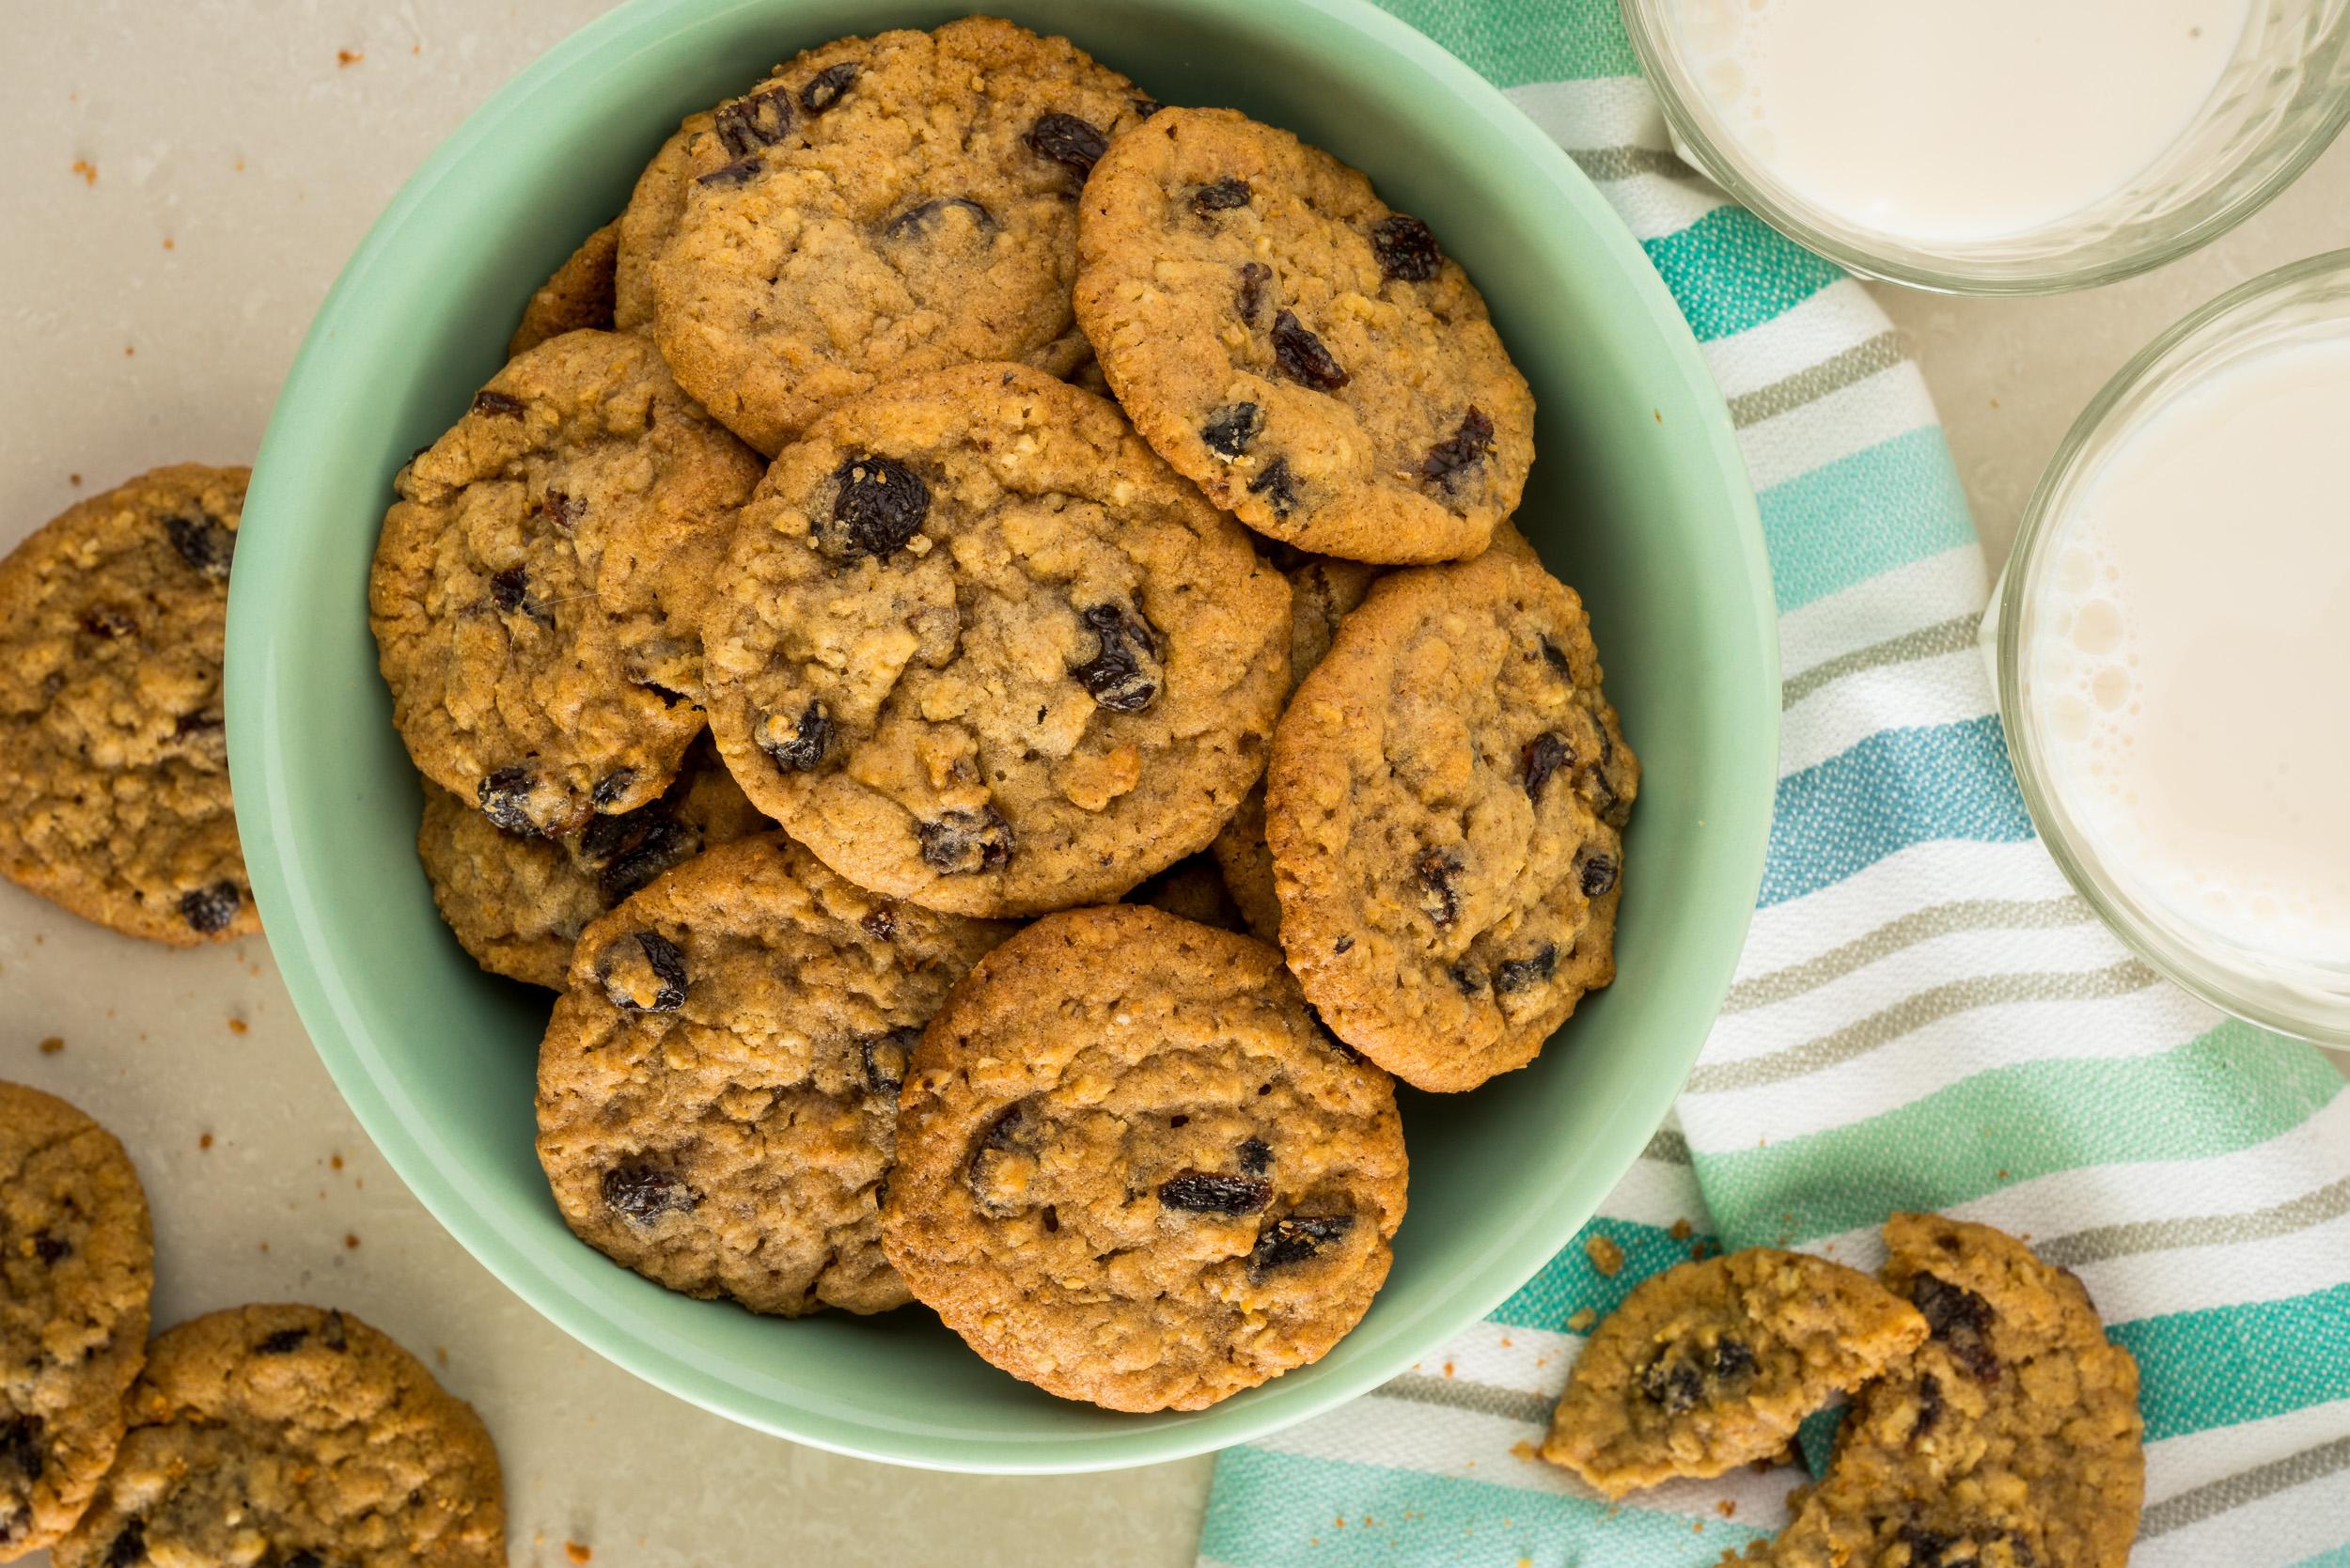 Raisin_Cookies_Miami_food_photographer_Franklin_Castillo.jpg